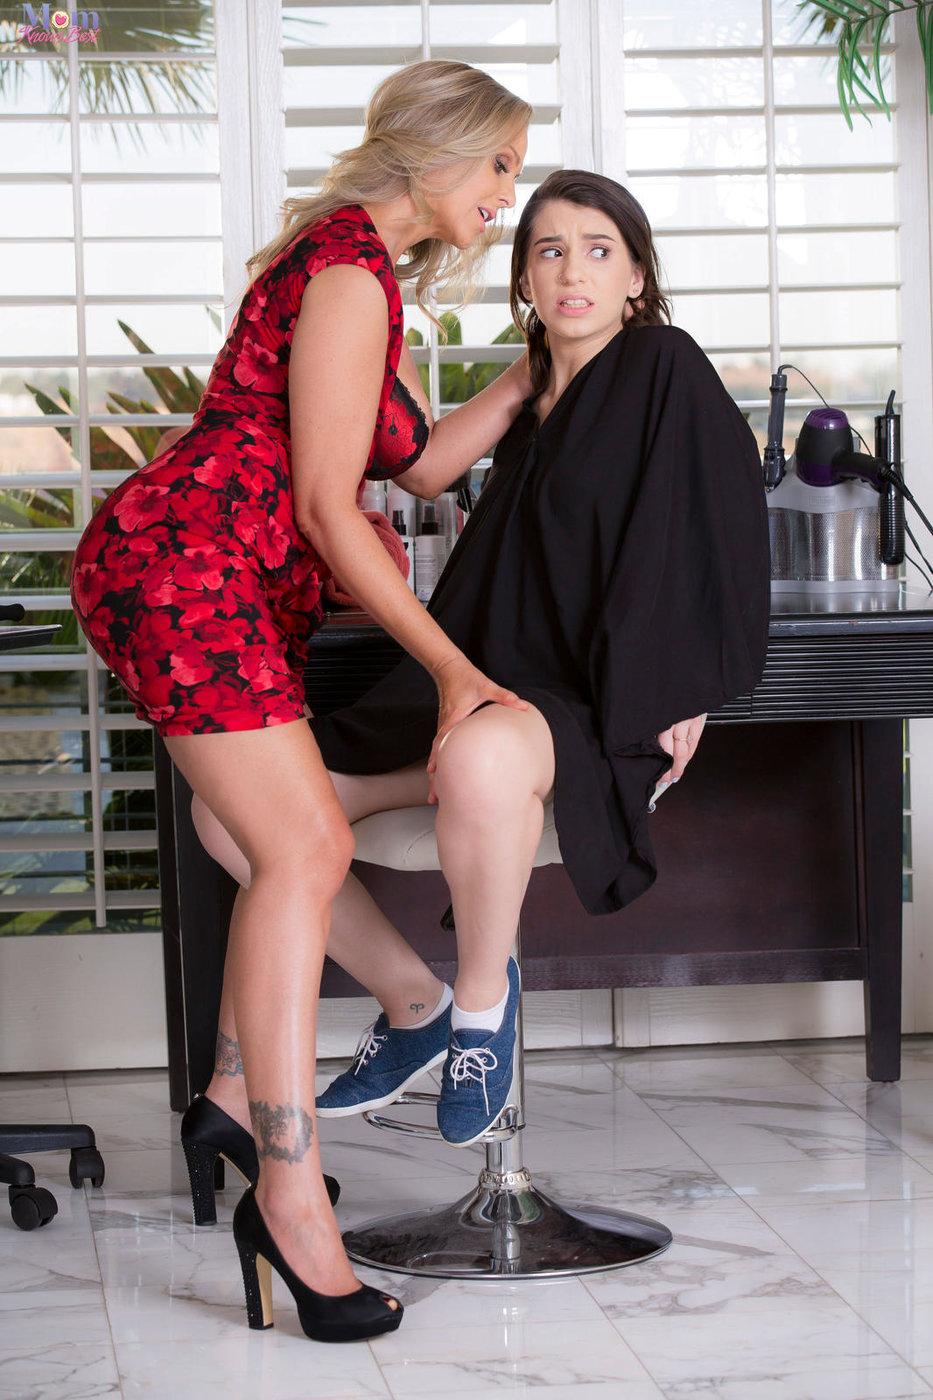 Dress Wearing Blonde Milf Hairdresser Fucks A Dark Haired Teen Client